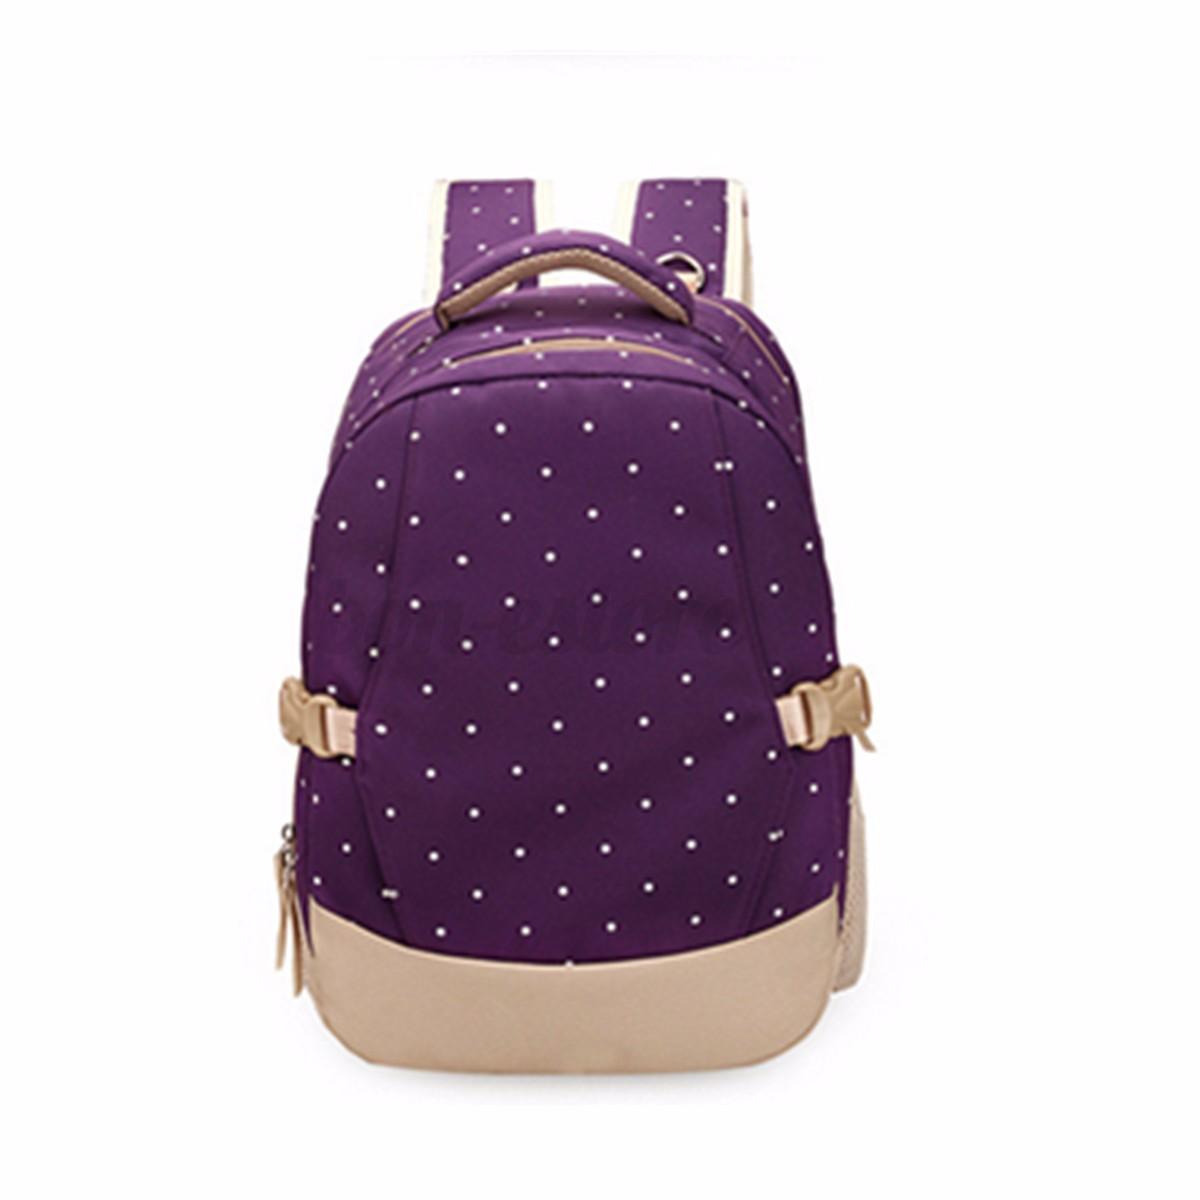 Baby Travel Bags Ebay